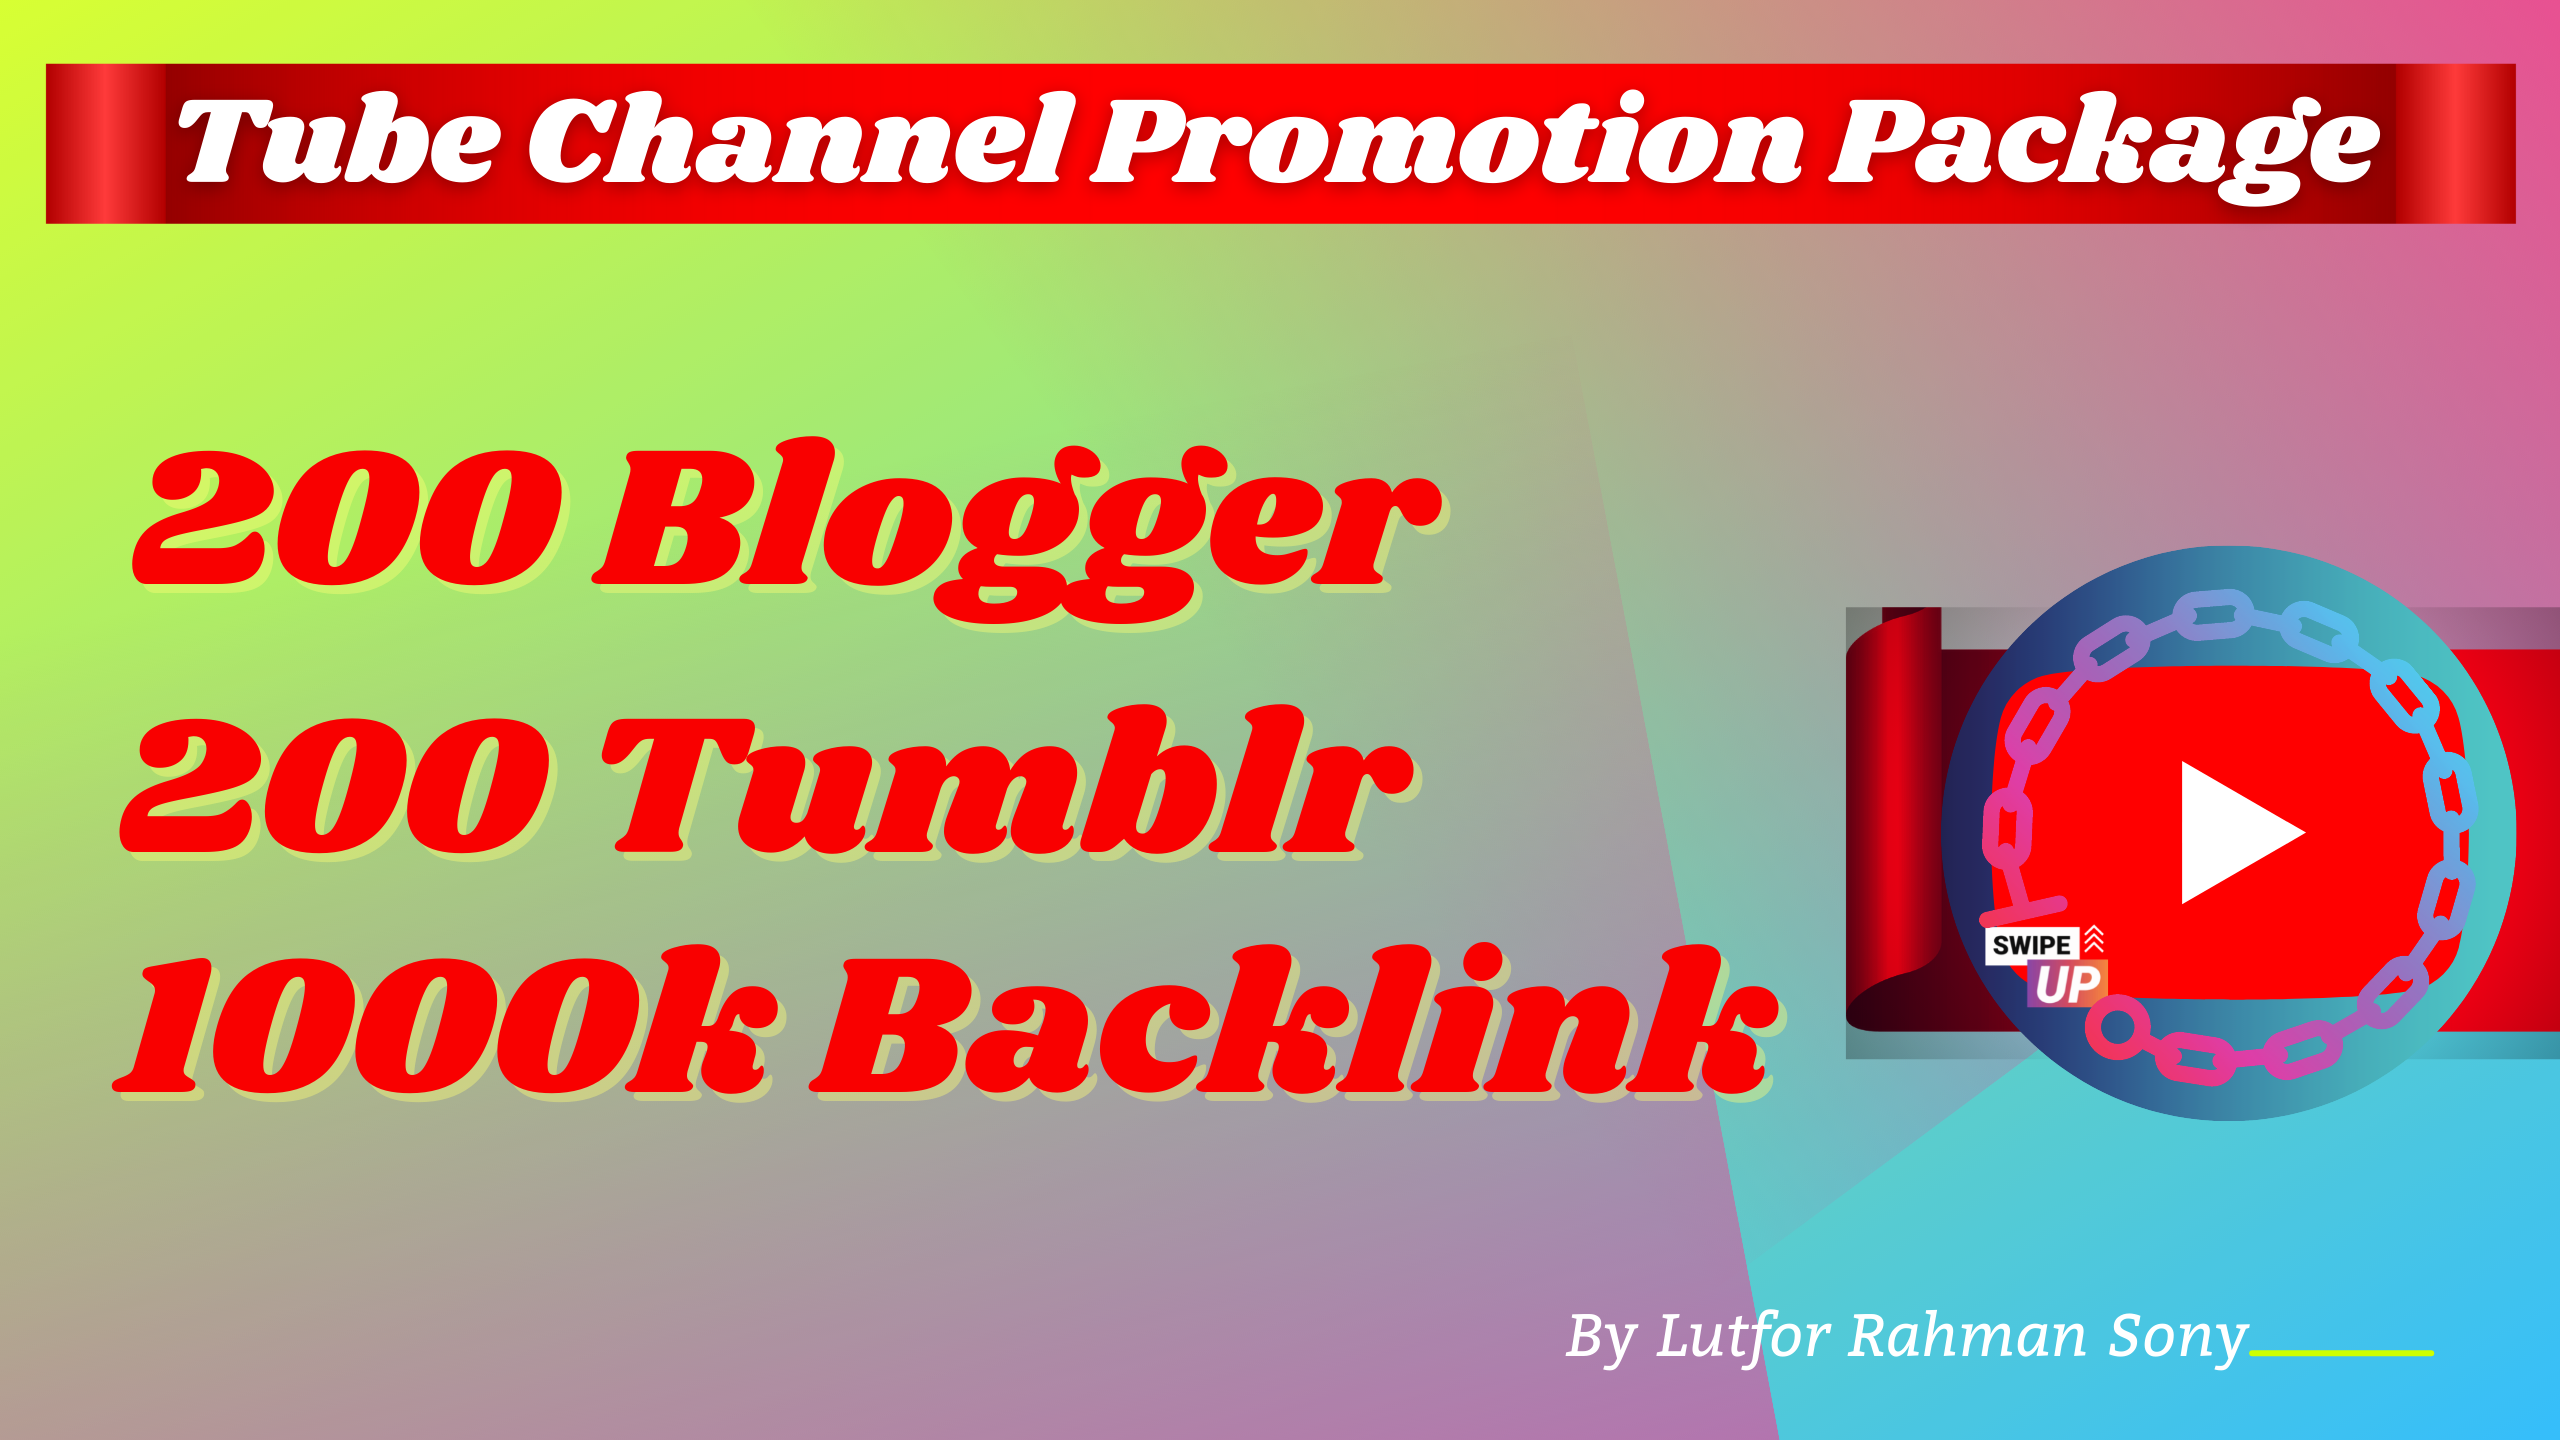 Video Channel Marketing - 12 Million Embeds + 200 Blogger,  200 Tumblr & EDU backlinks